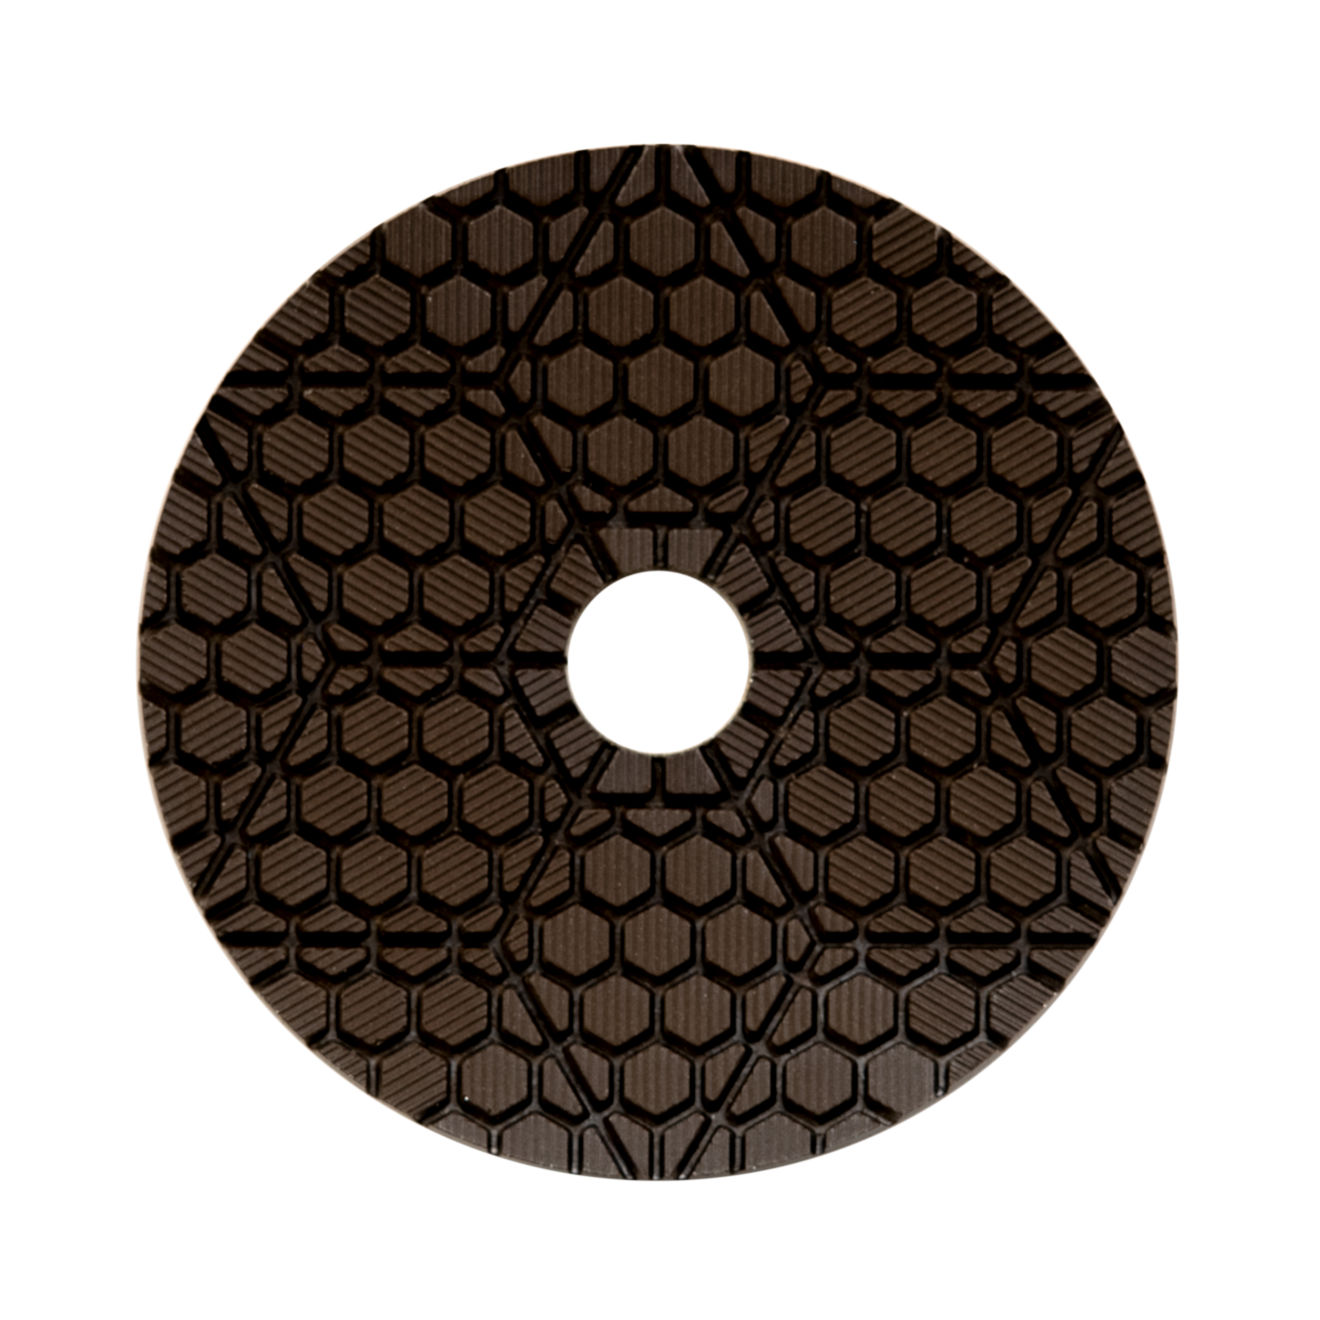 "ODYN Premium Wet Stone Polishing Pad 4"" x 5/8"" - 100 Grit"